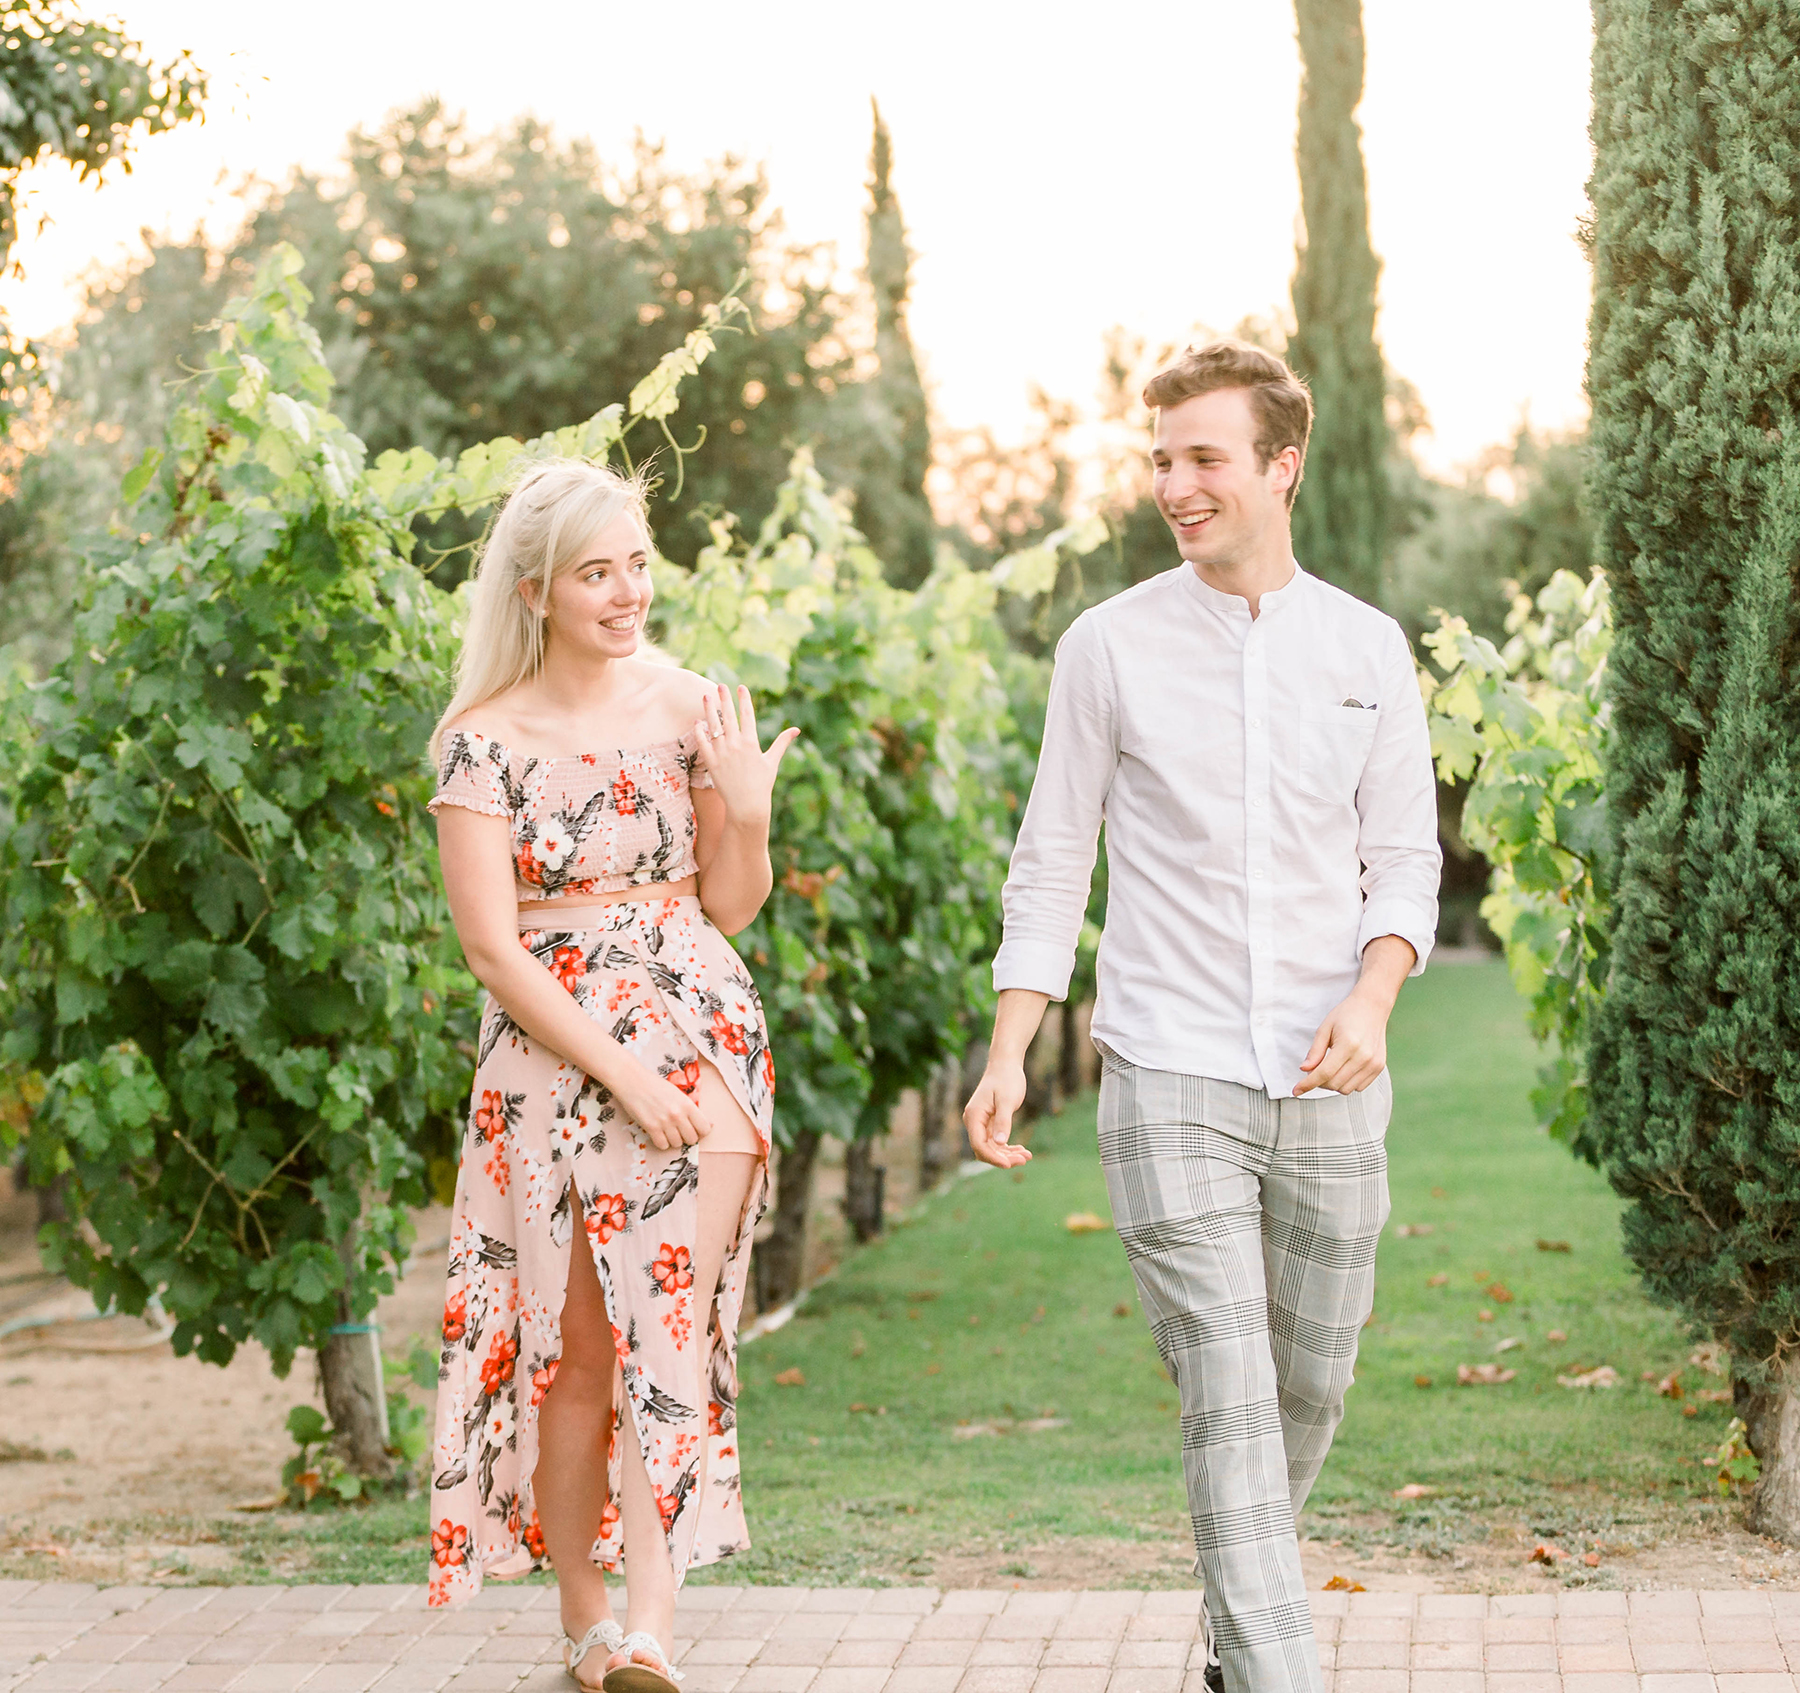 Sweet Vineyard Proposal in California Janita Mestre17